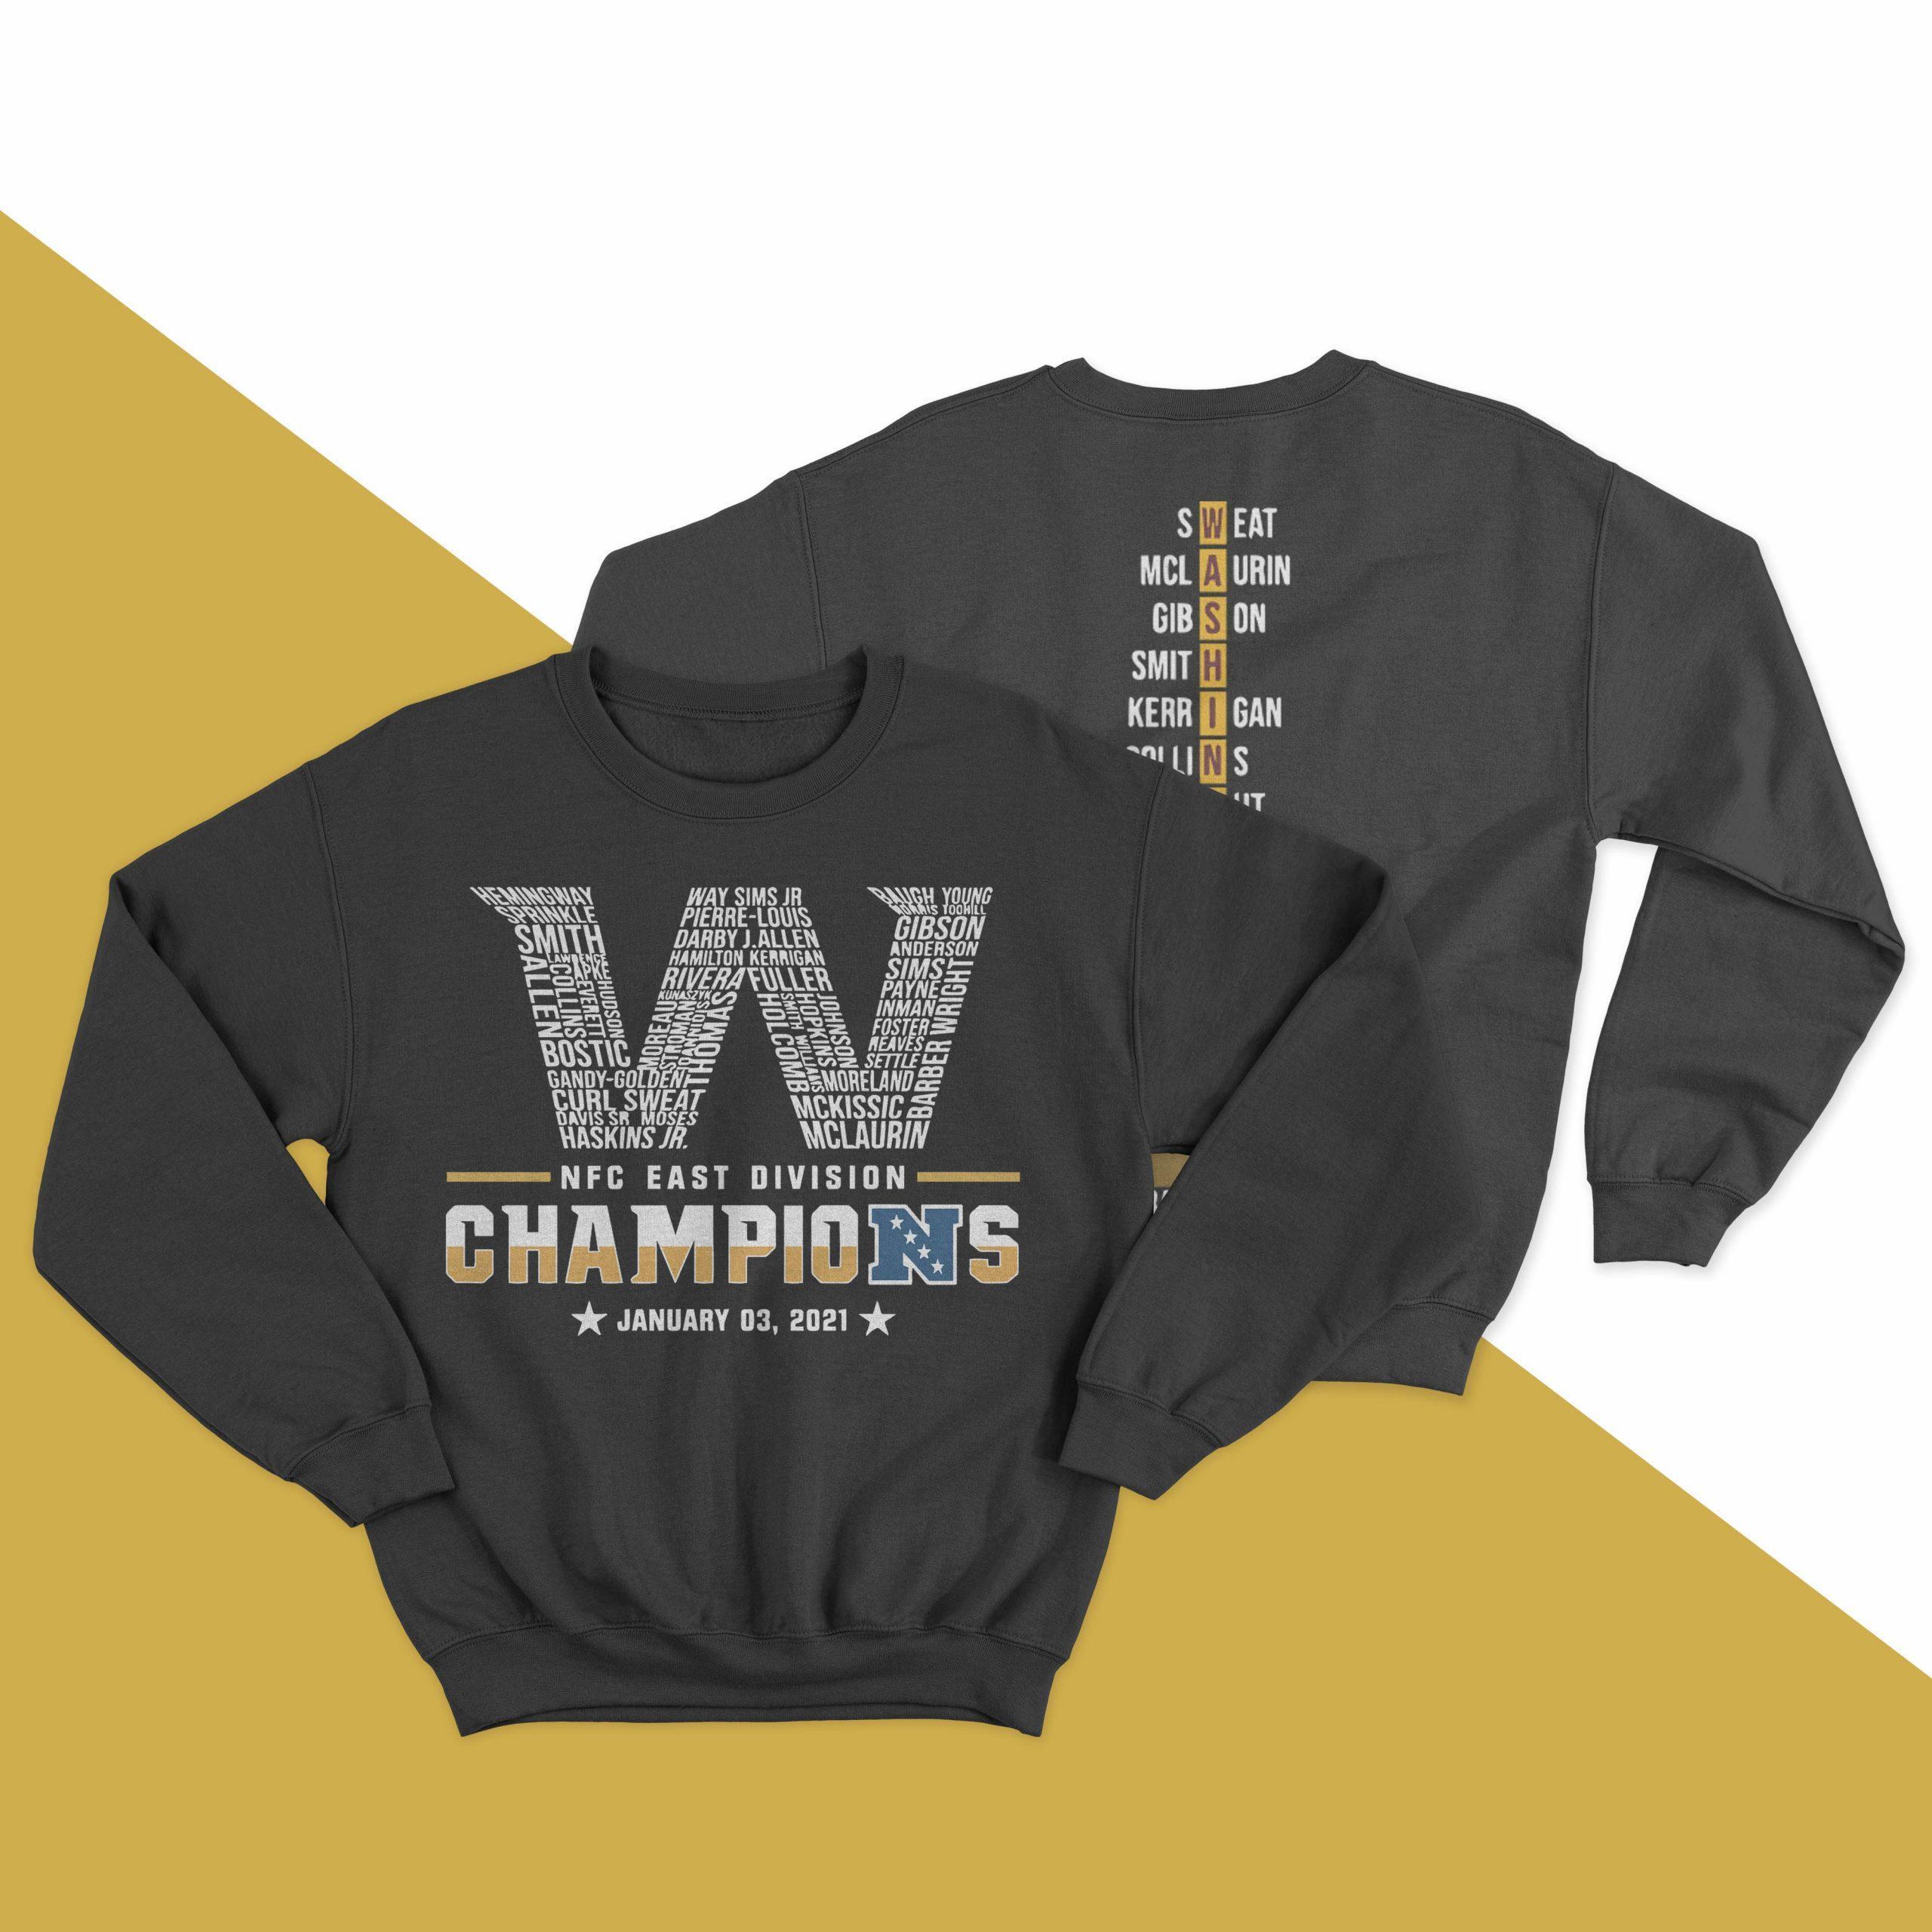 Washington Nfc East Division Champions January 03 2021 Sweater